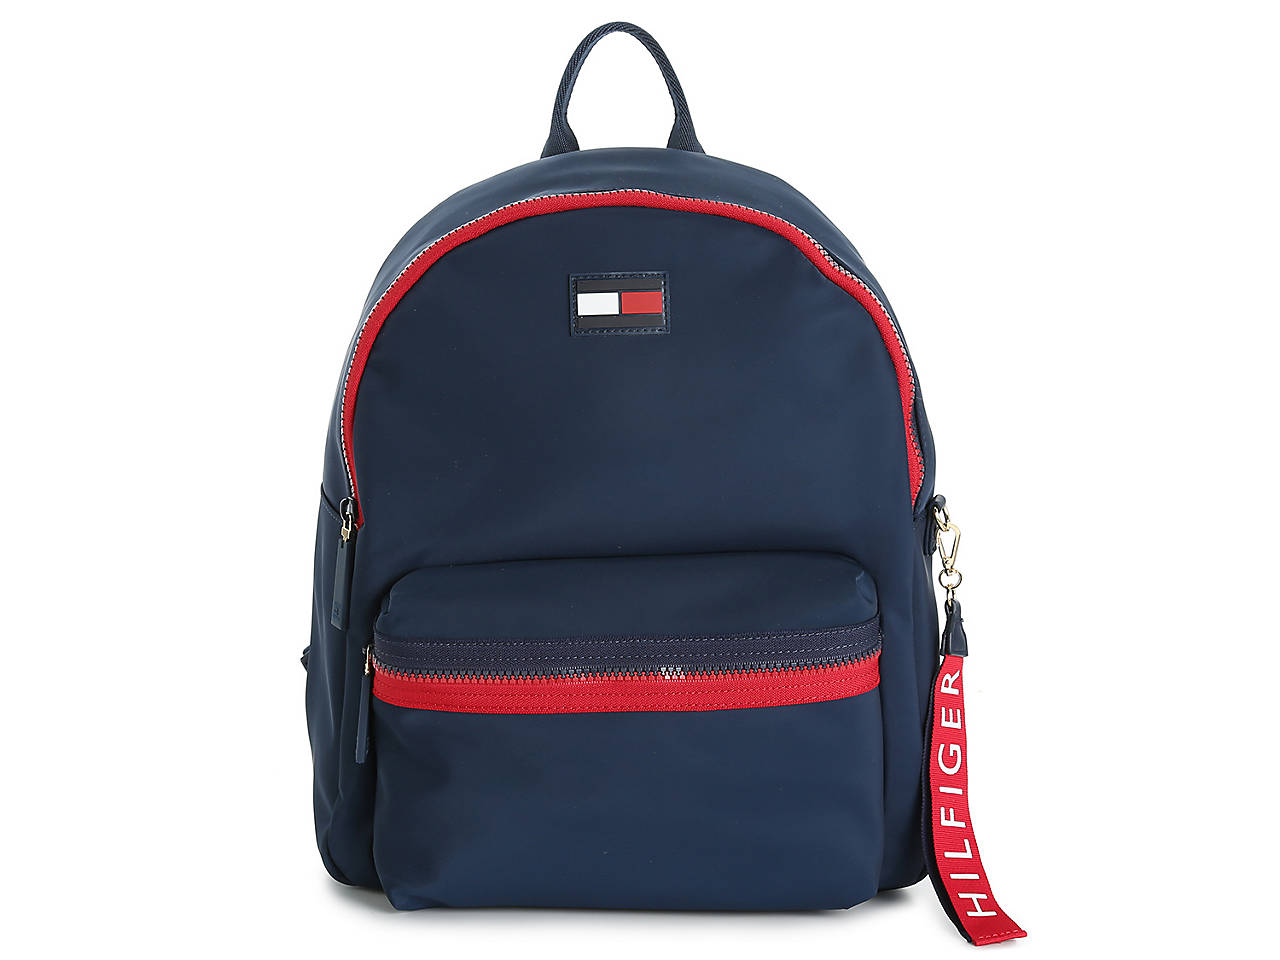 673bd95fc5 Tommy Hilfiger Leah Backpack Women's Handbags & Accessories   DSW